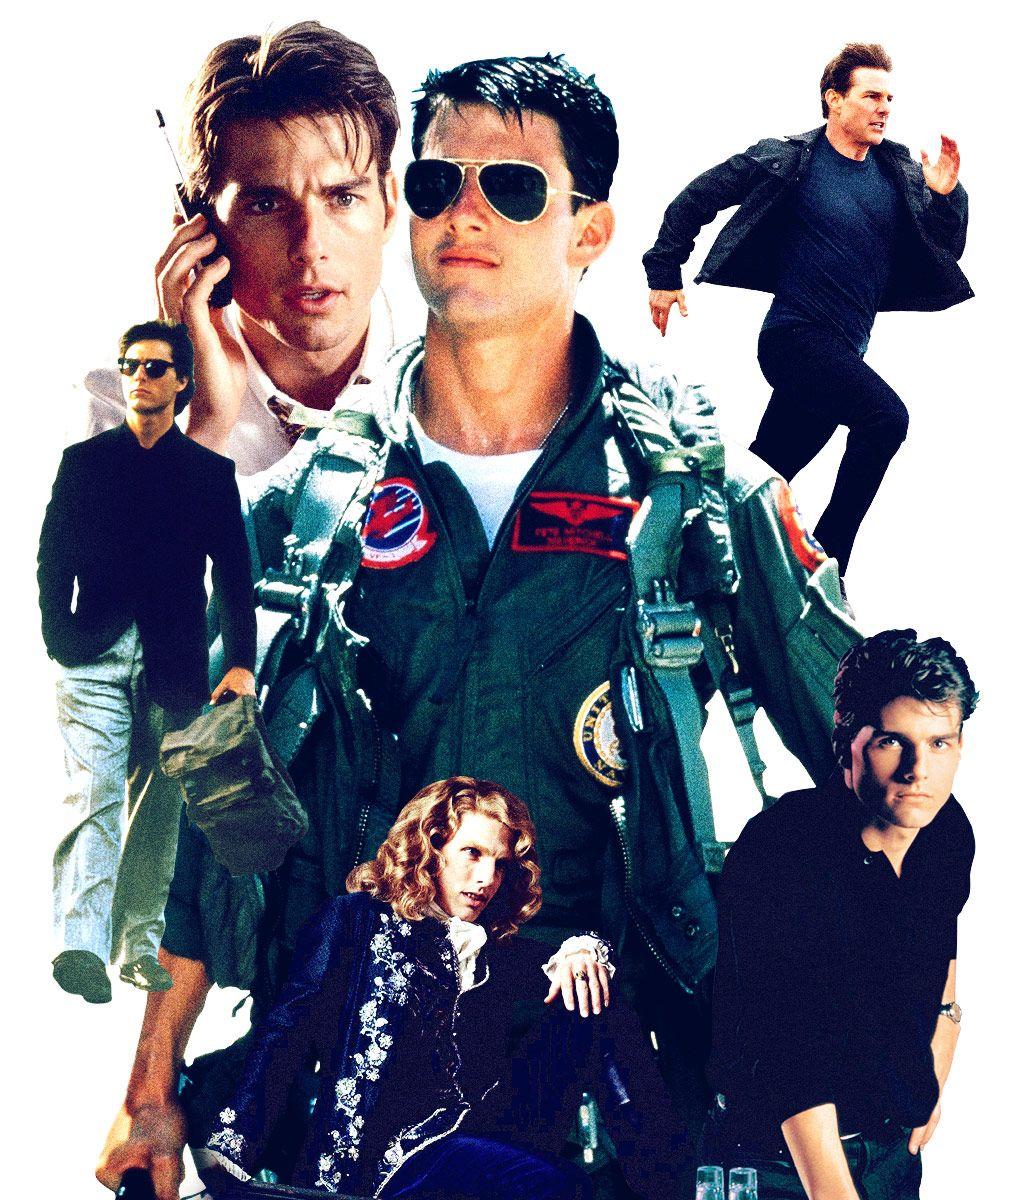 f5019799f8 Every Tom Cruise Movie Performance